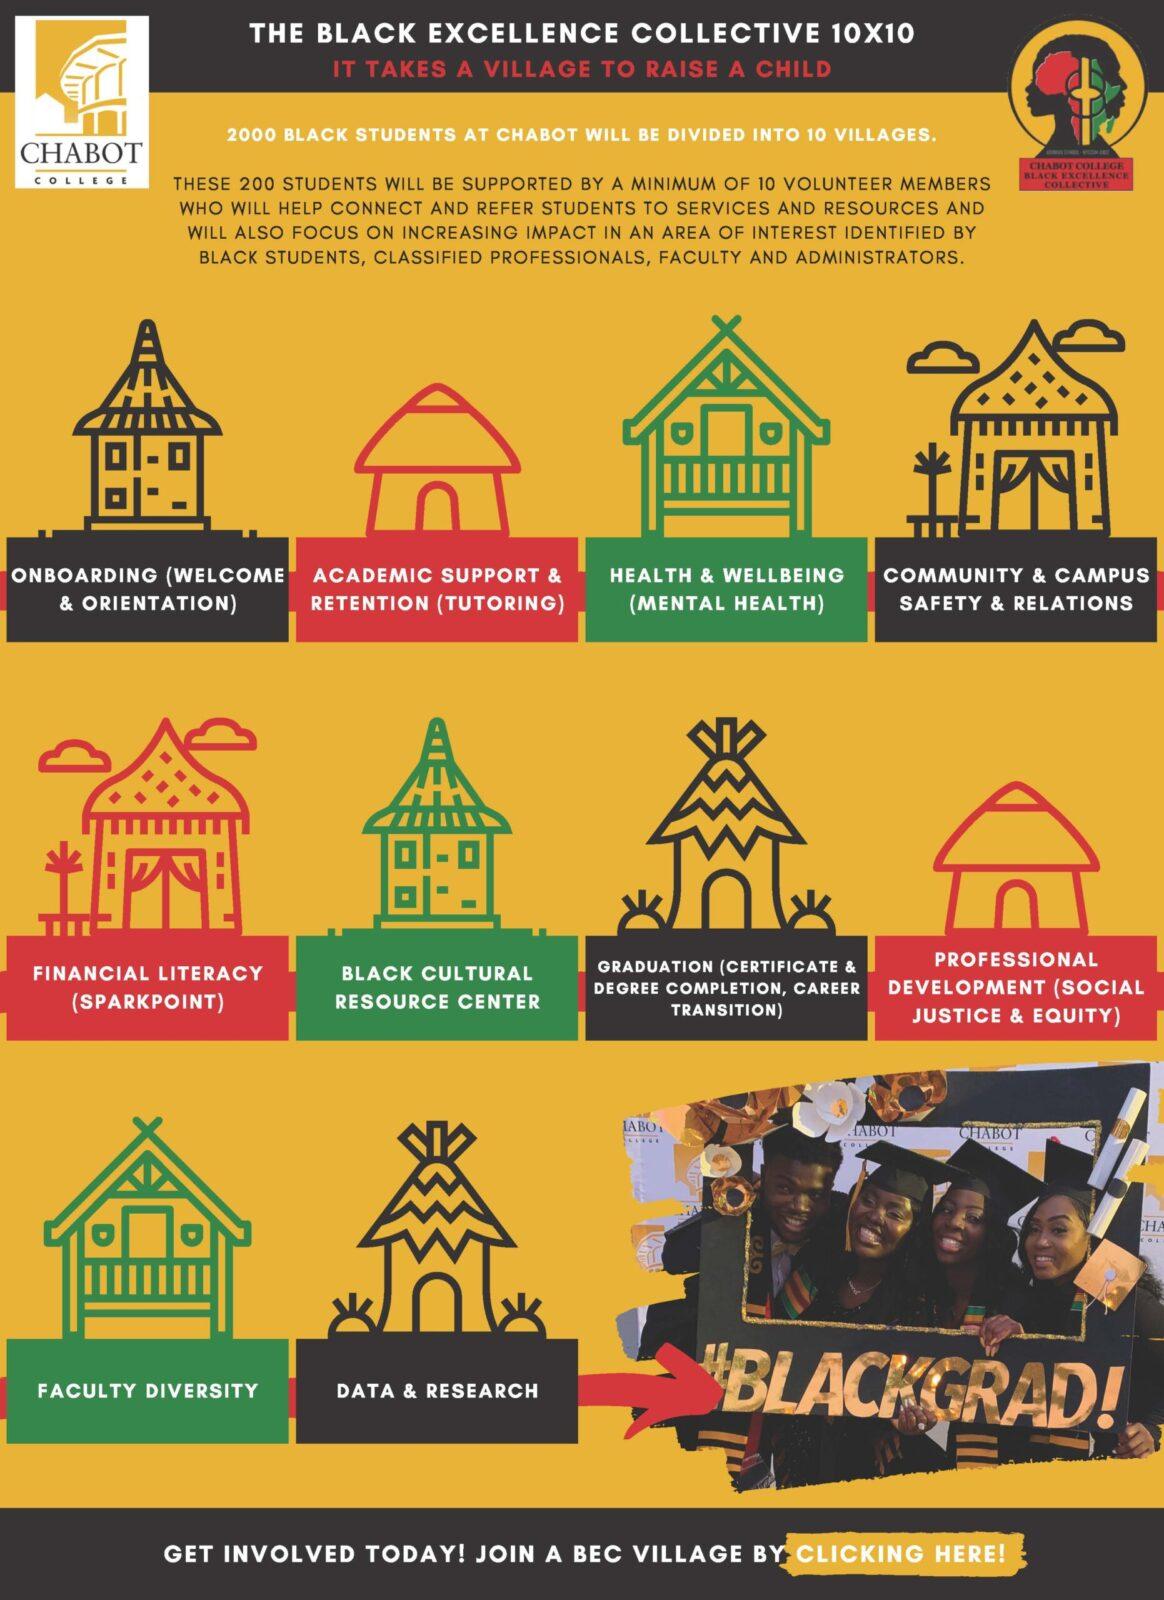 The Black Excellence Collective (BEC) 10×10 Village Teams